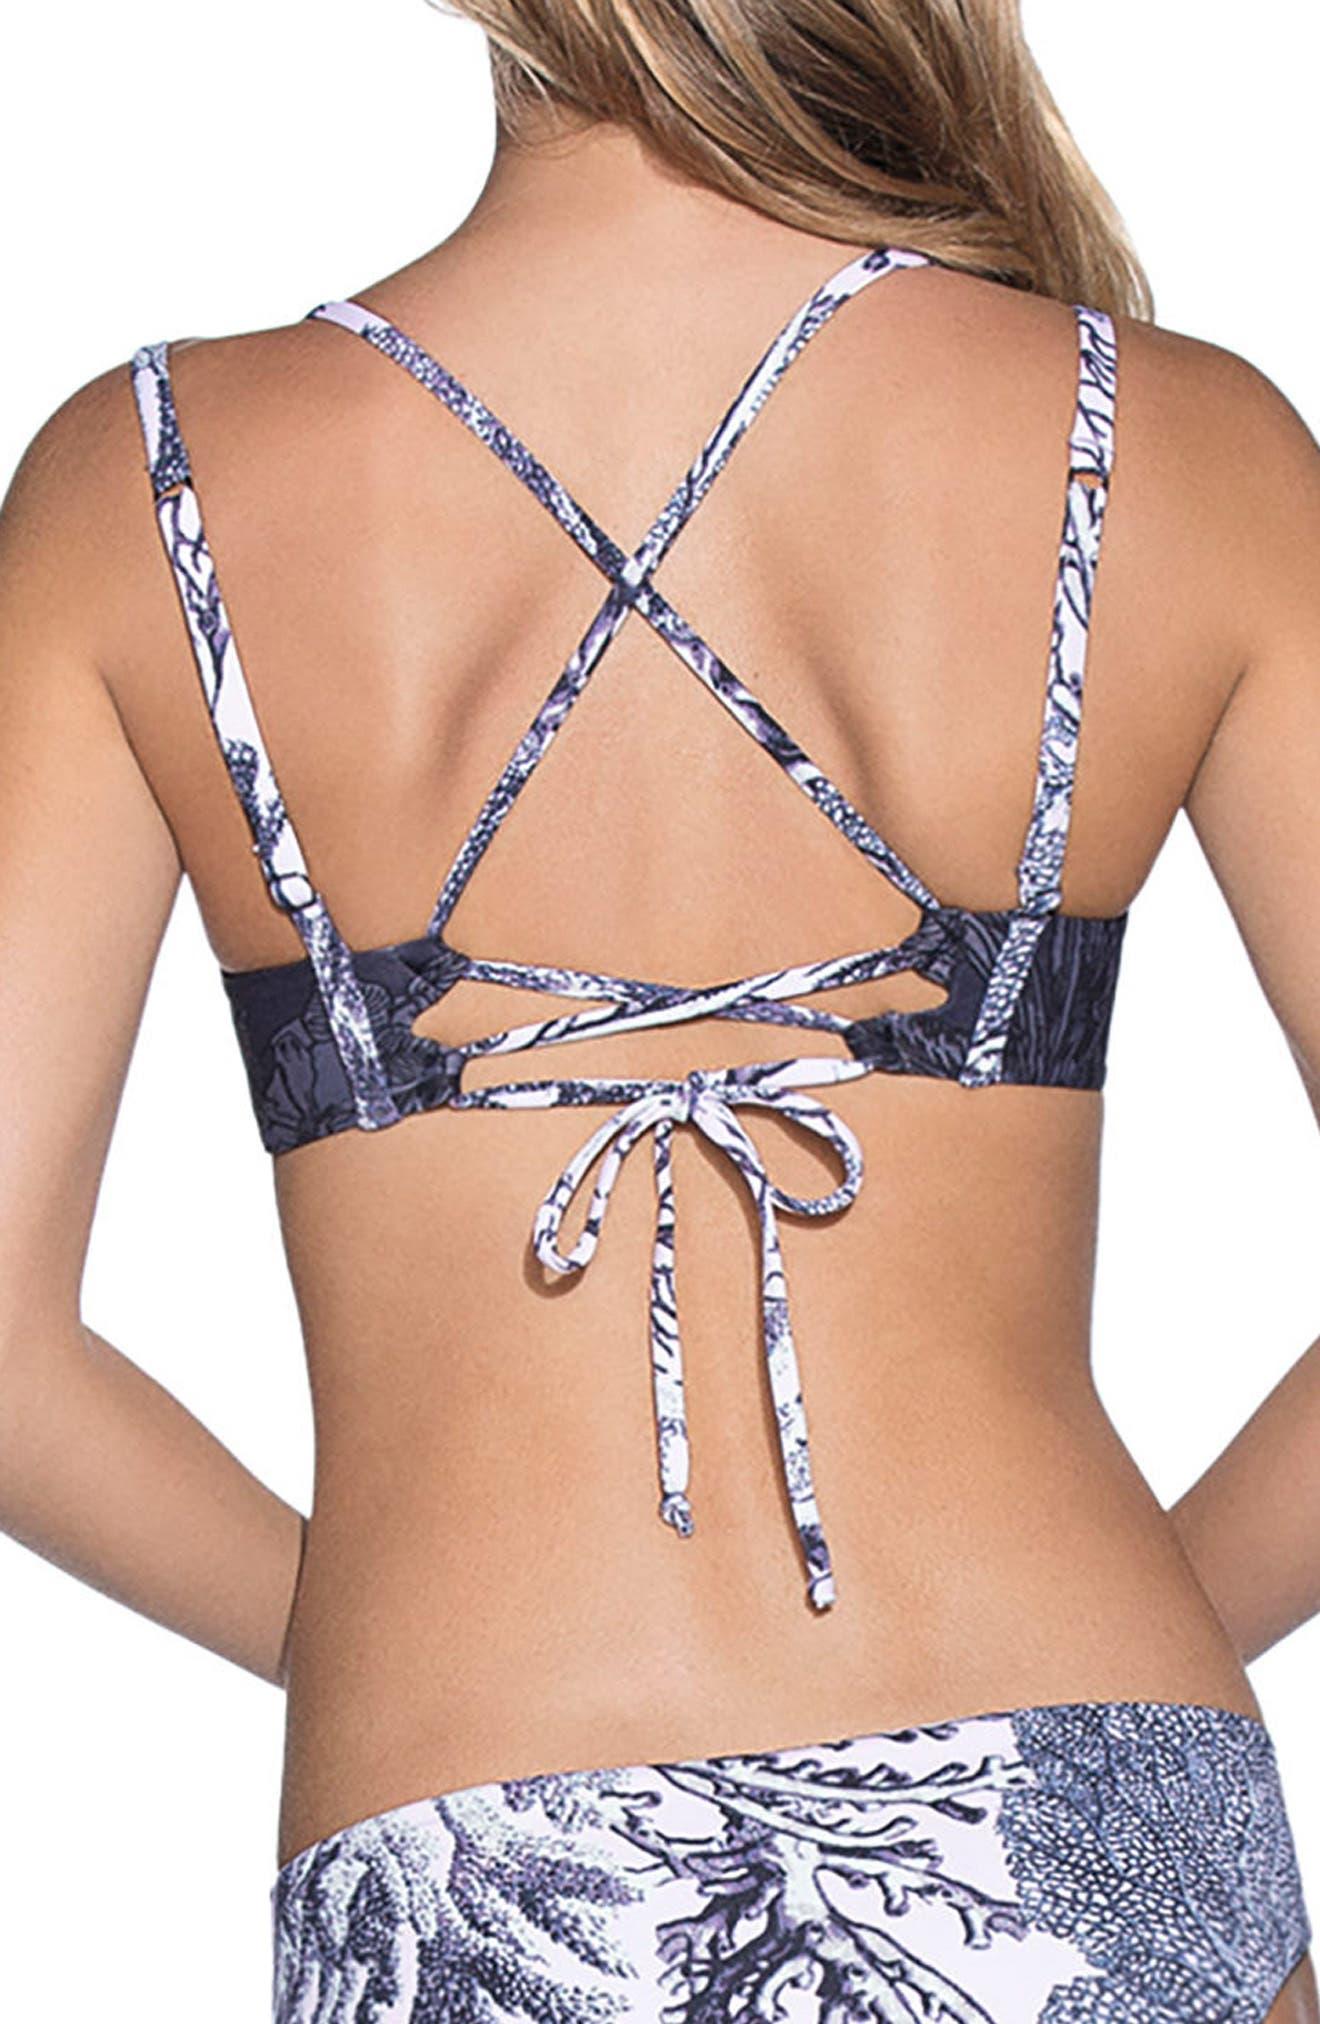 Alternate Image 2  - Maaji Buenaventura Nights Underwire Bikini Top